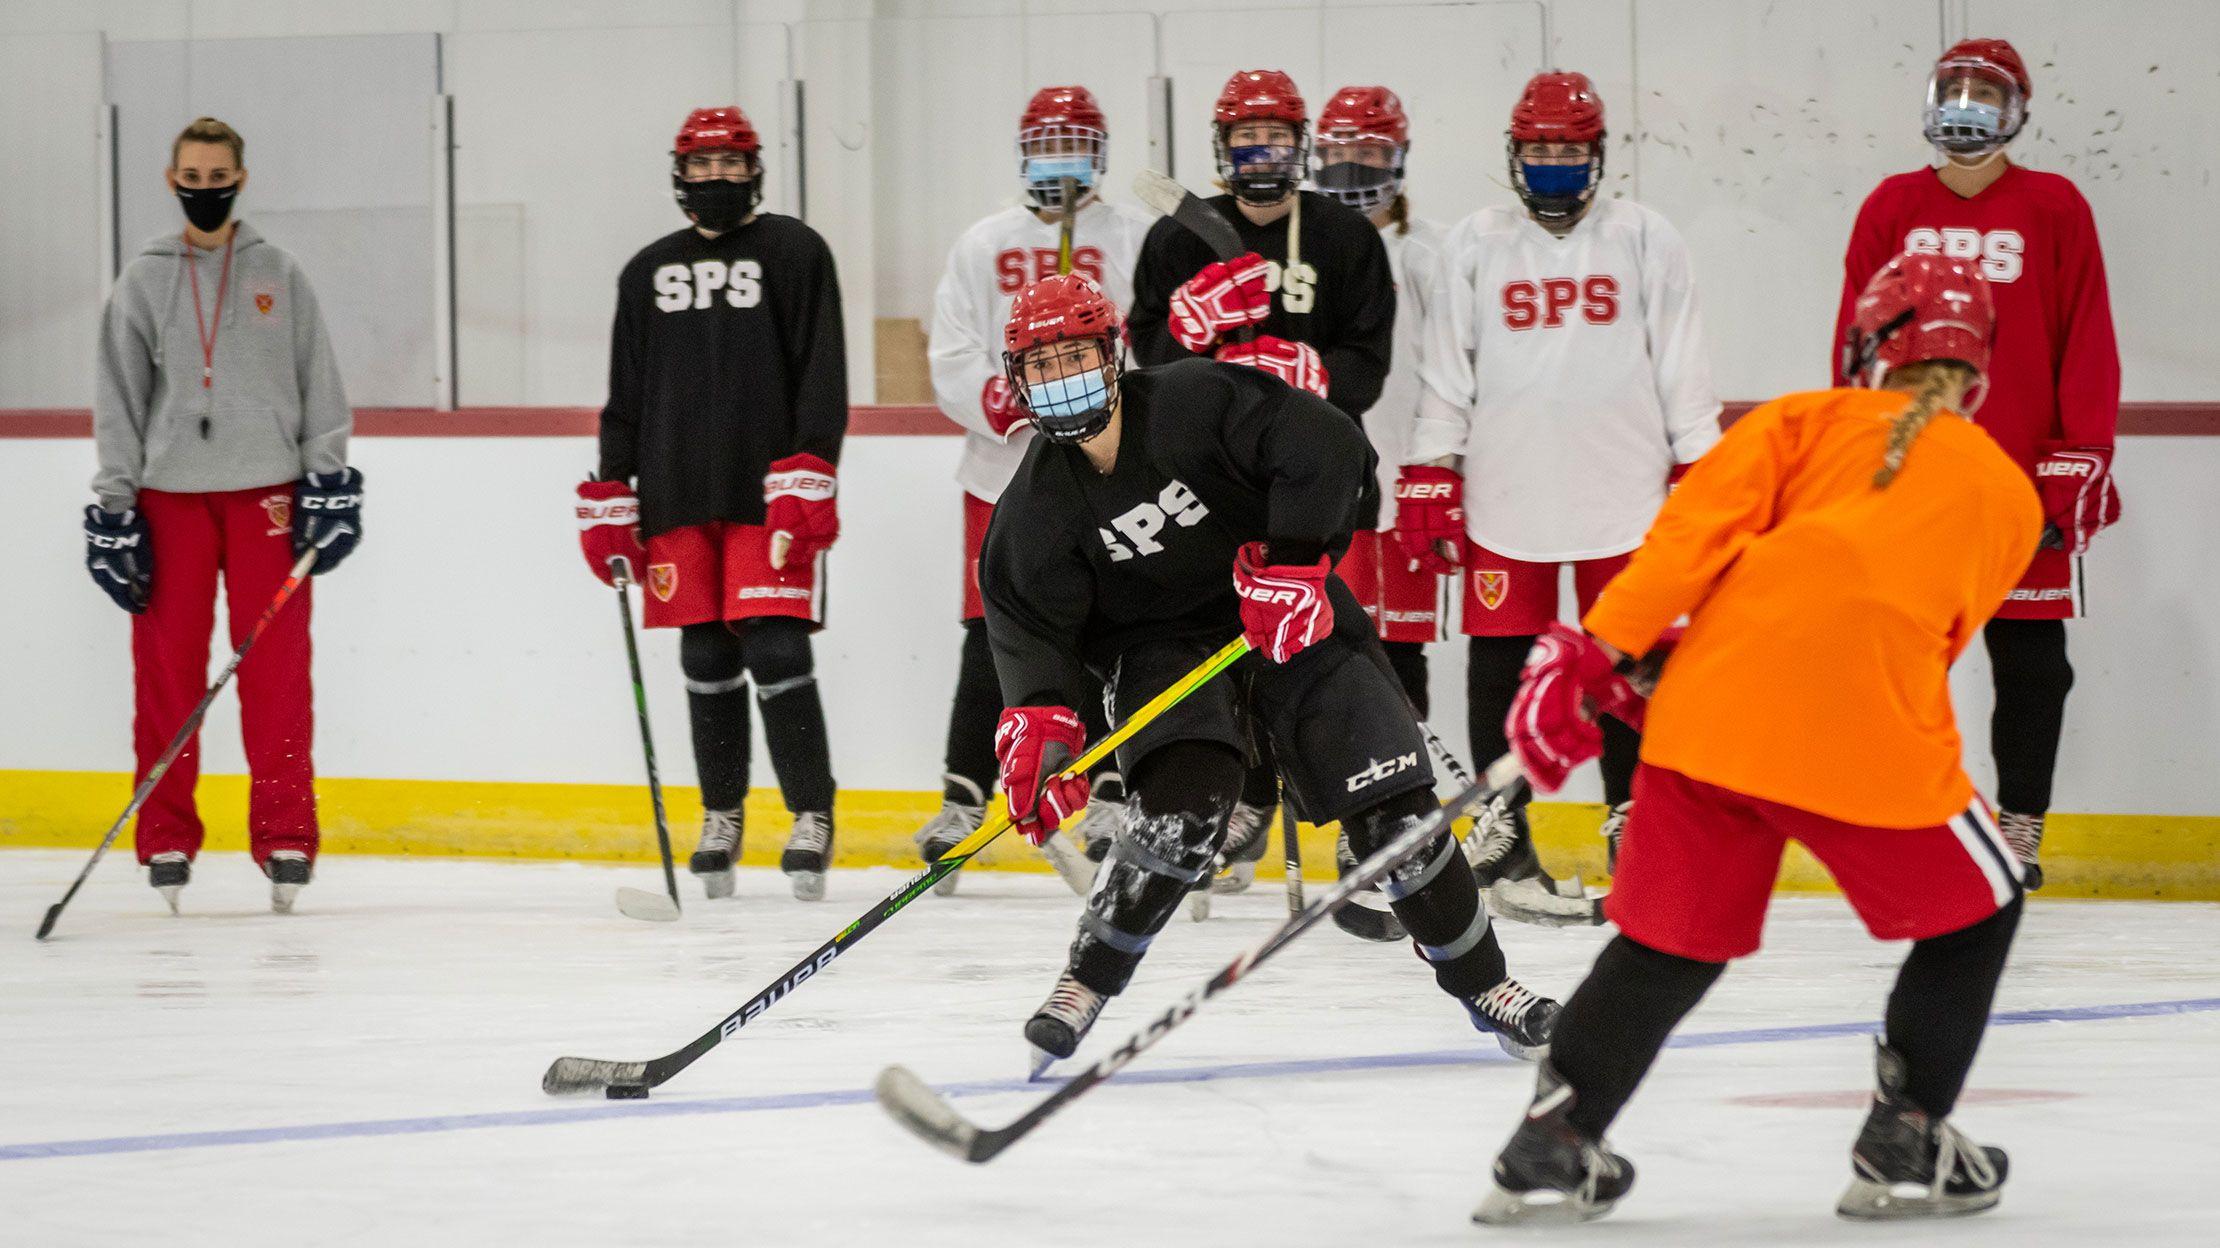 girls hockey practice